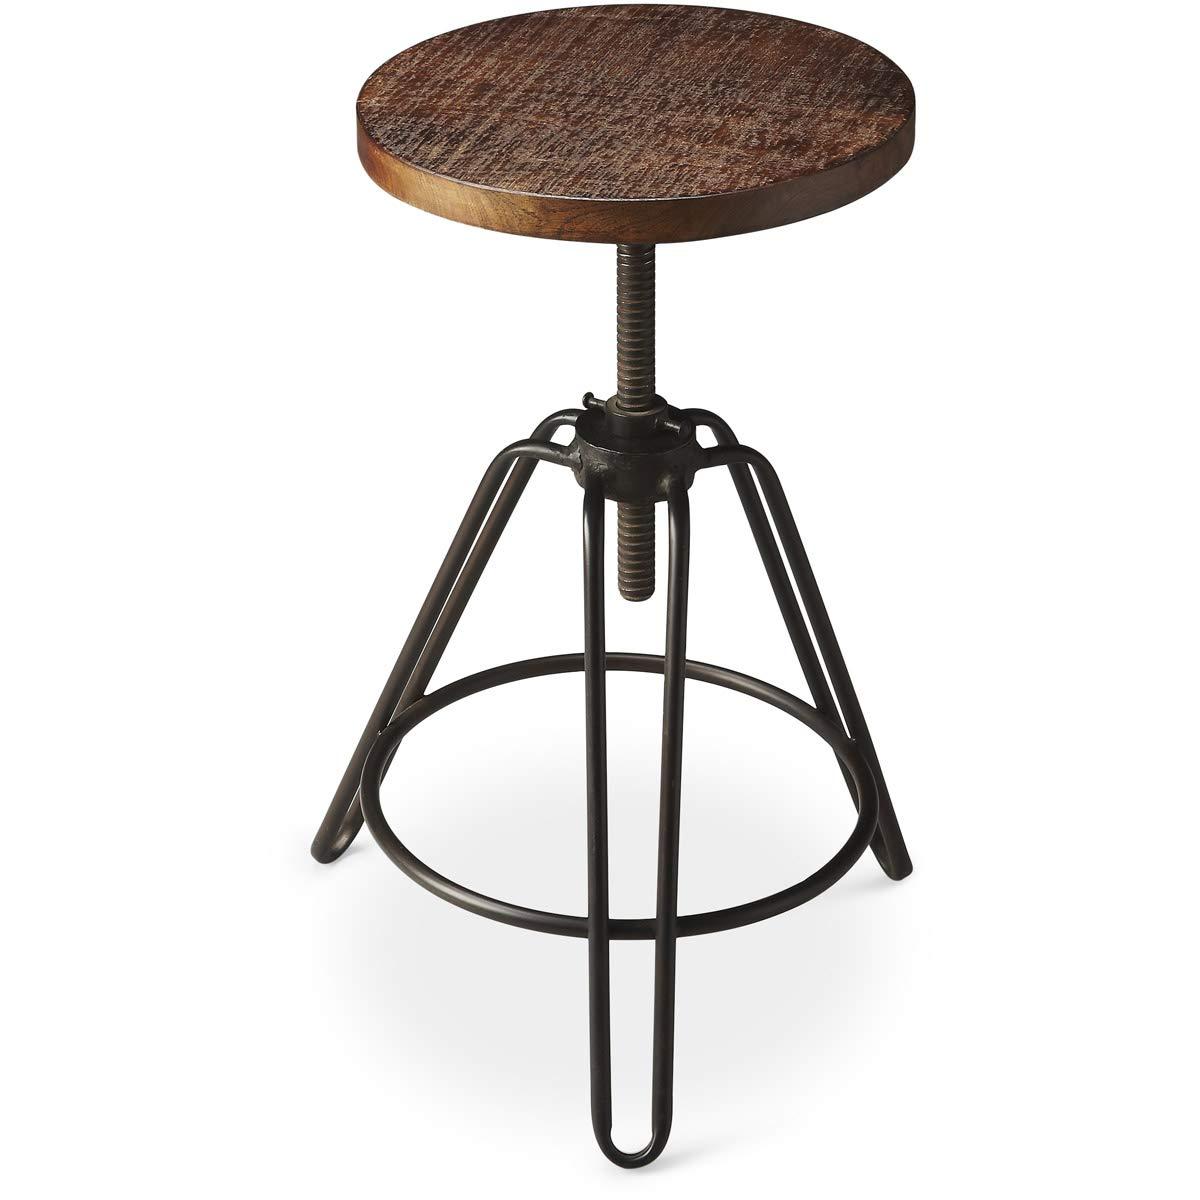 Wondrous Butler 2050025 Trenton Metal Wood Revolving Bar Stool Machost Co Dining Chair Design Ideas Machostcouk